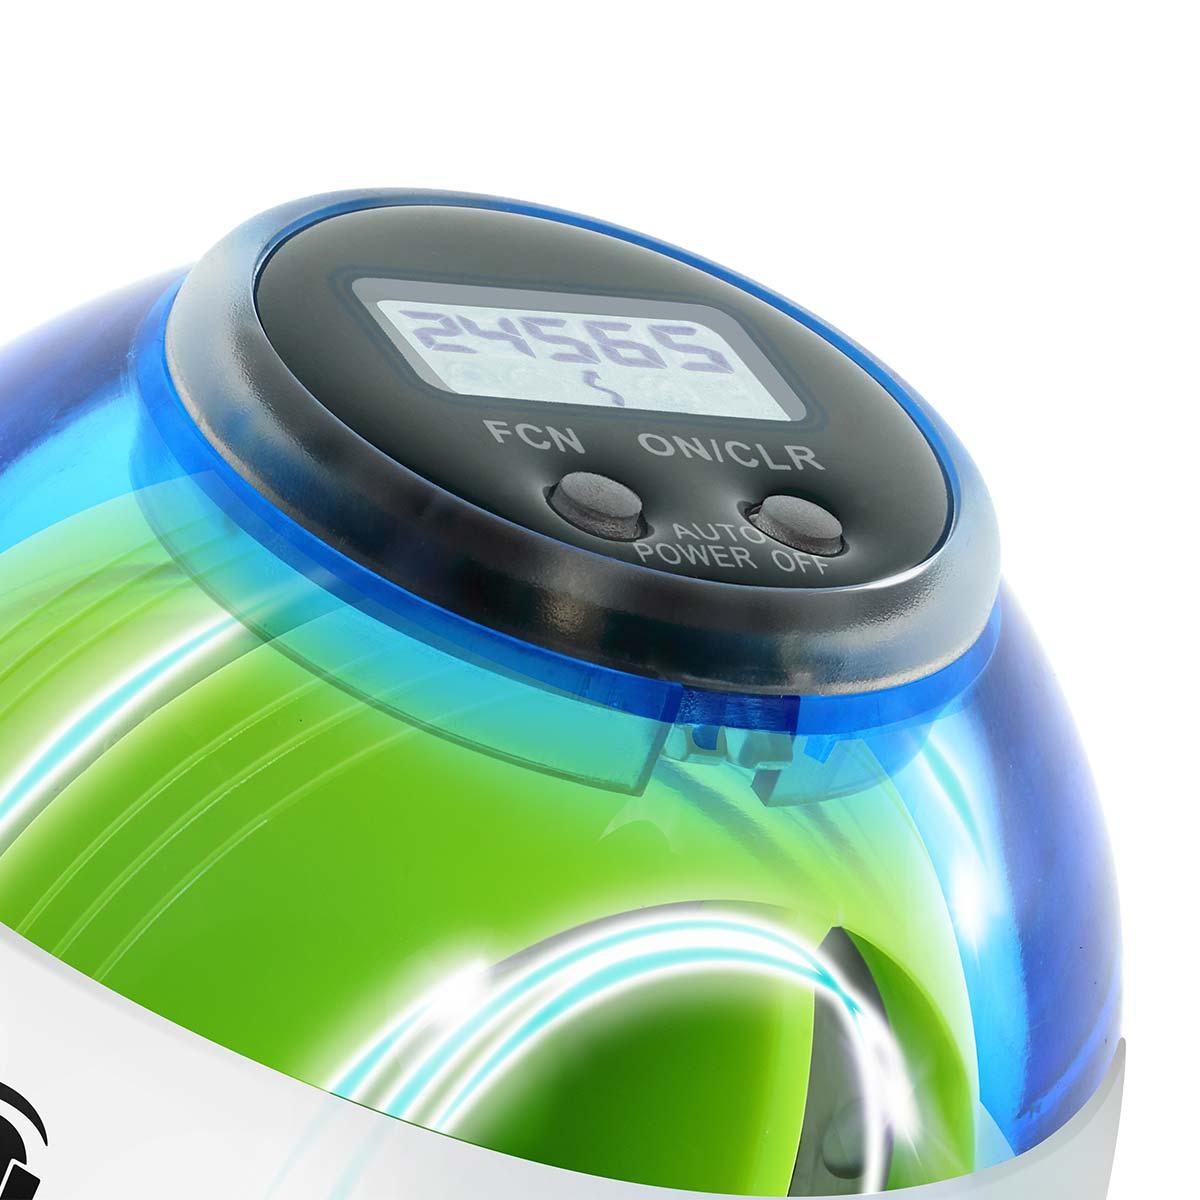 original-powerball-max-blue-detail